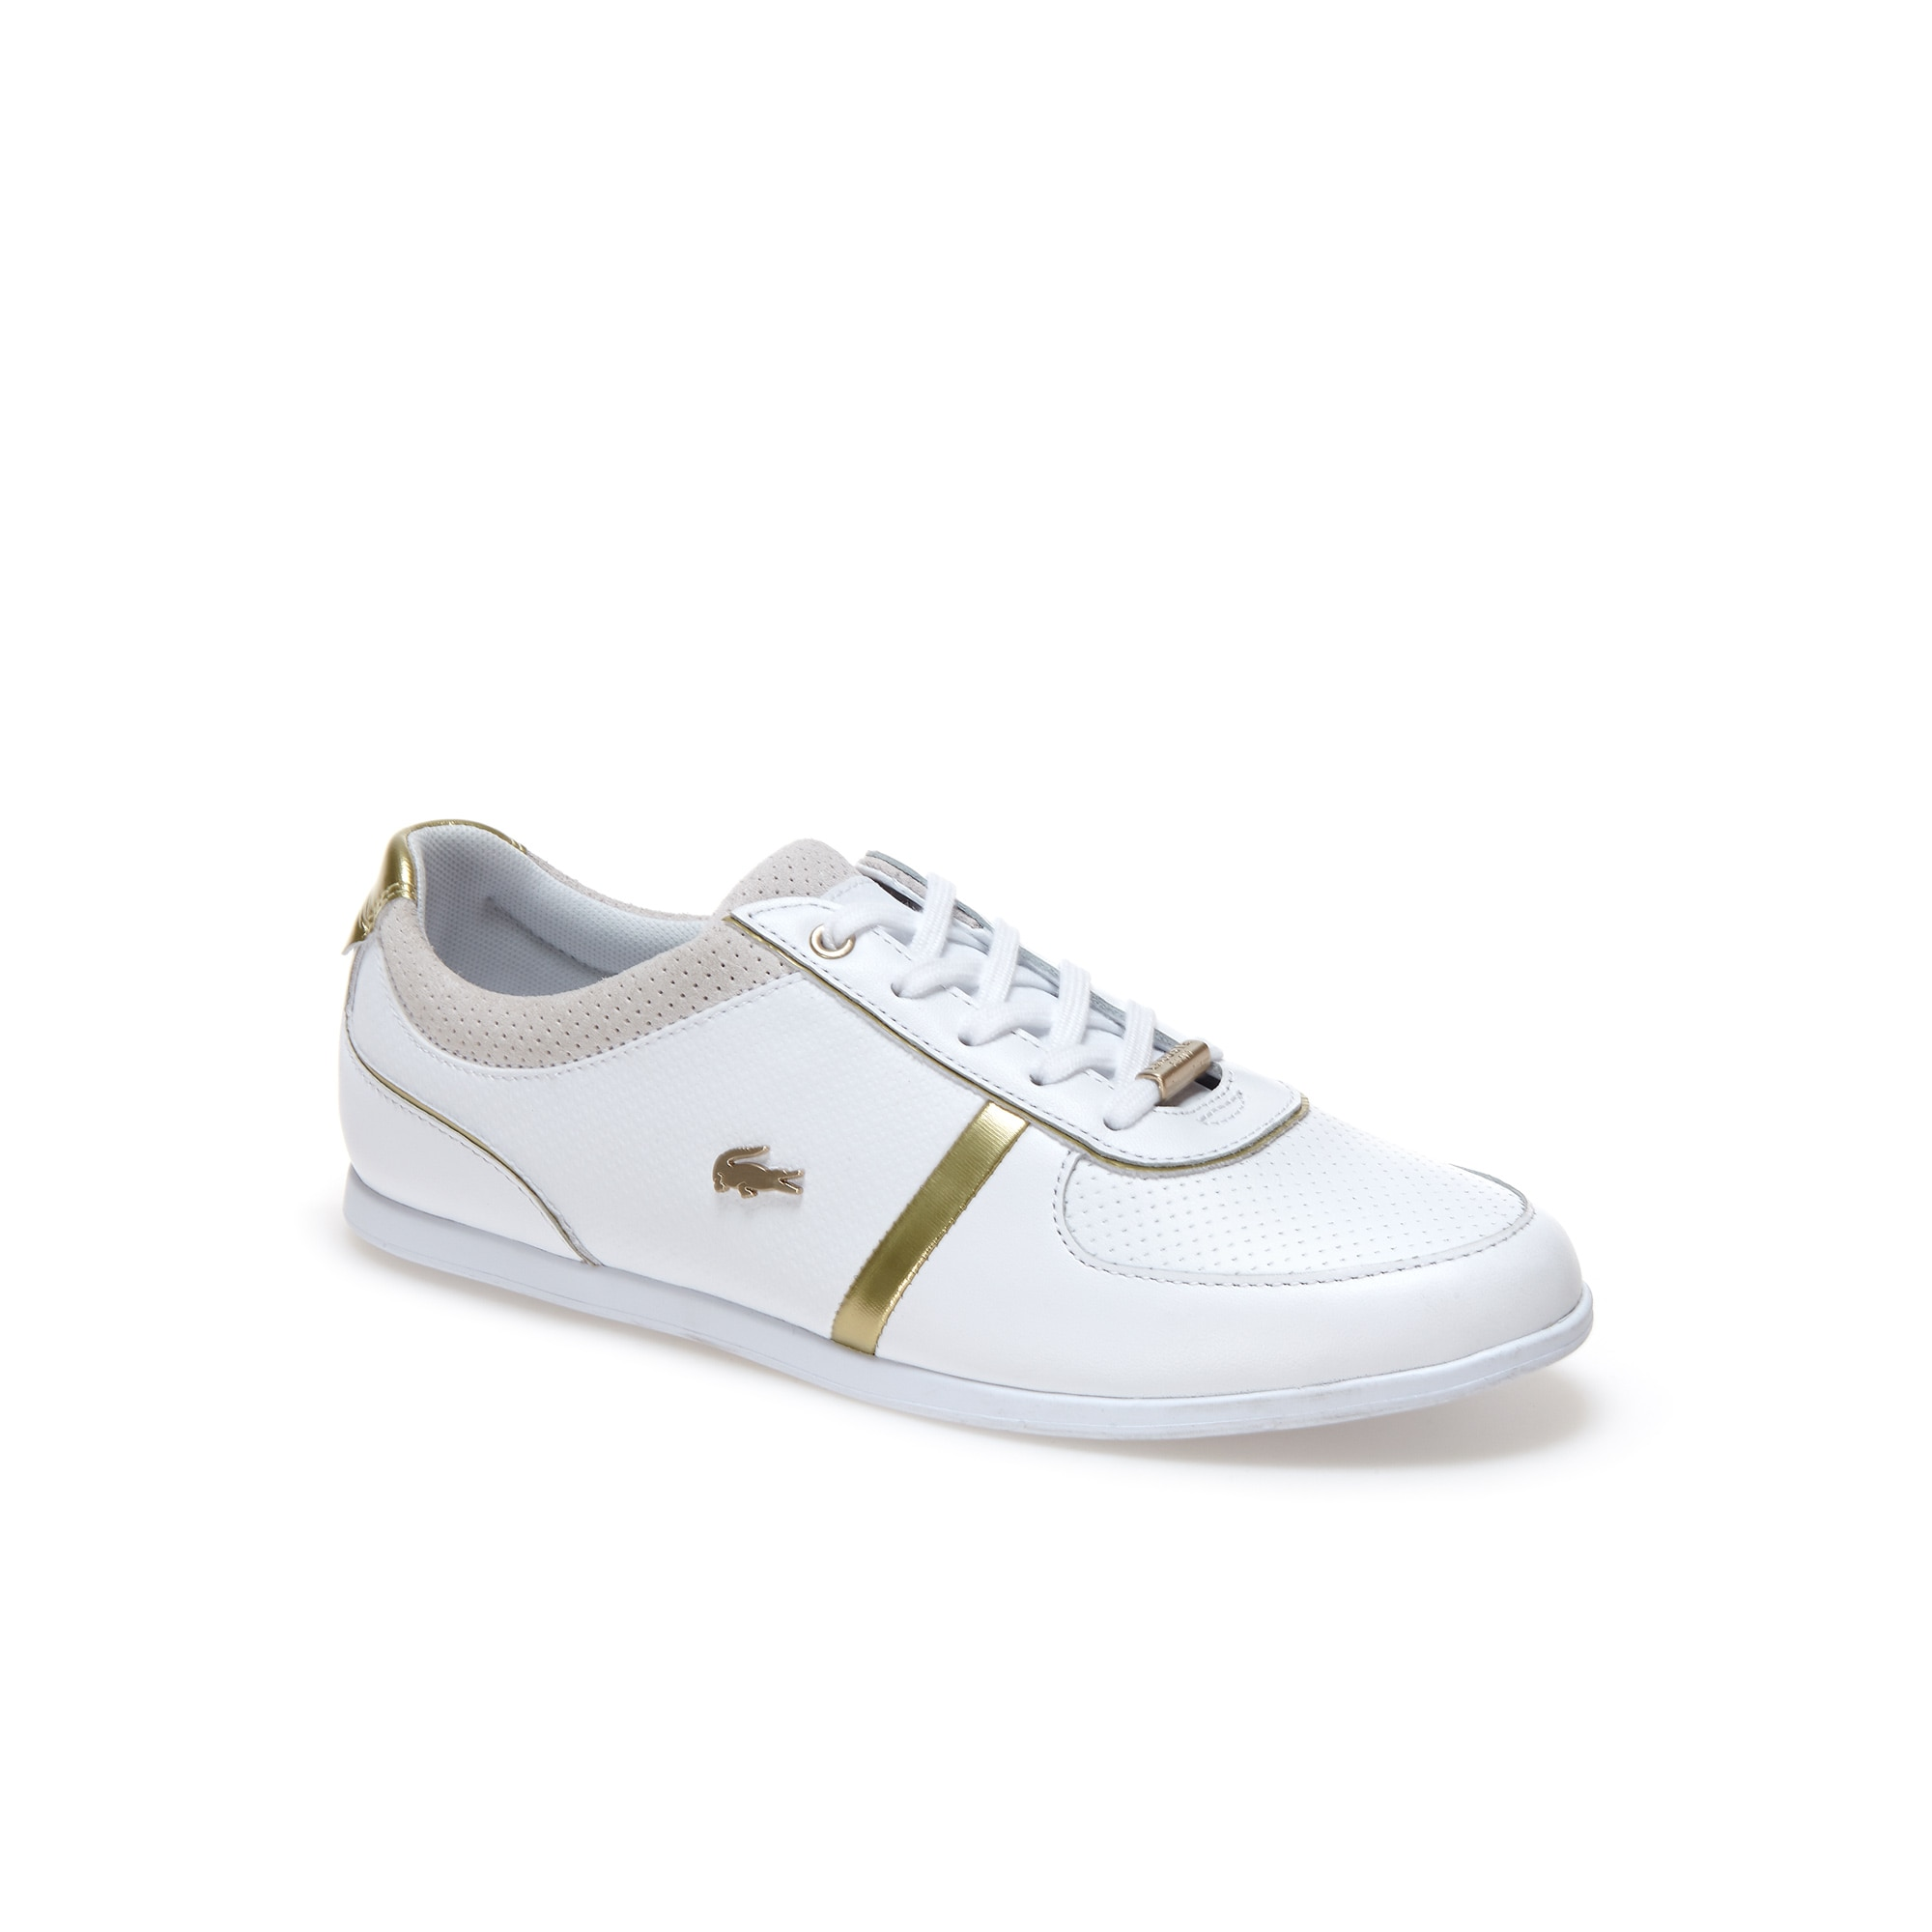 Damen-Sneakers REY SPORT aus Leder